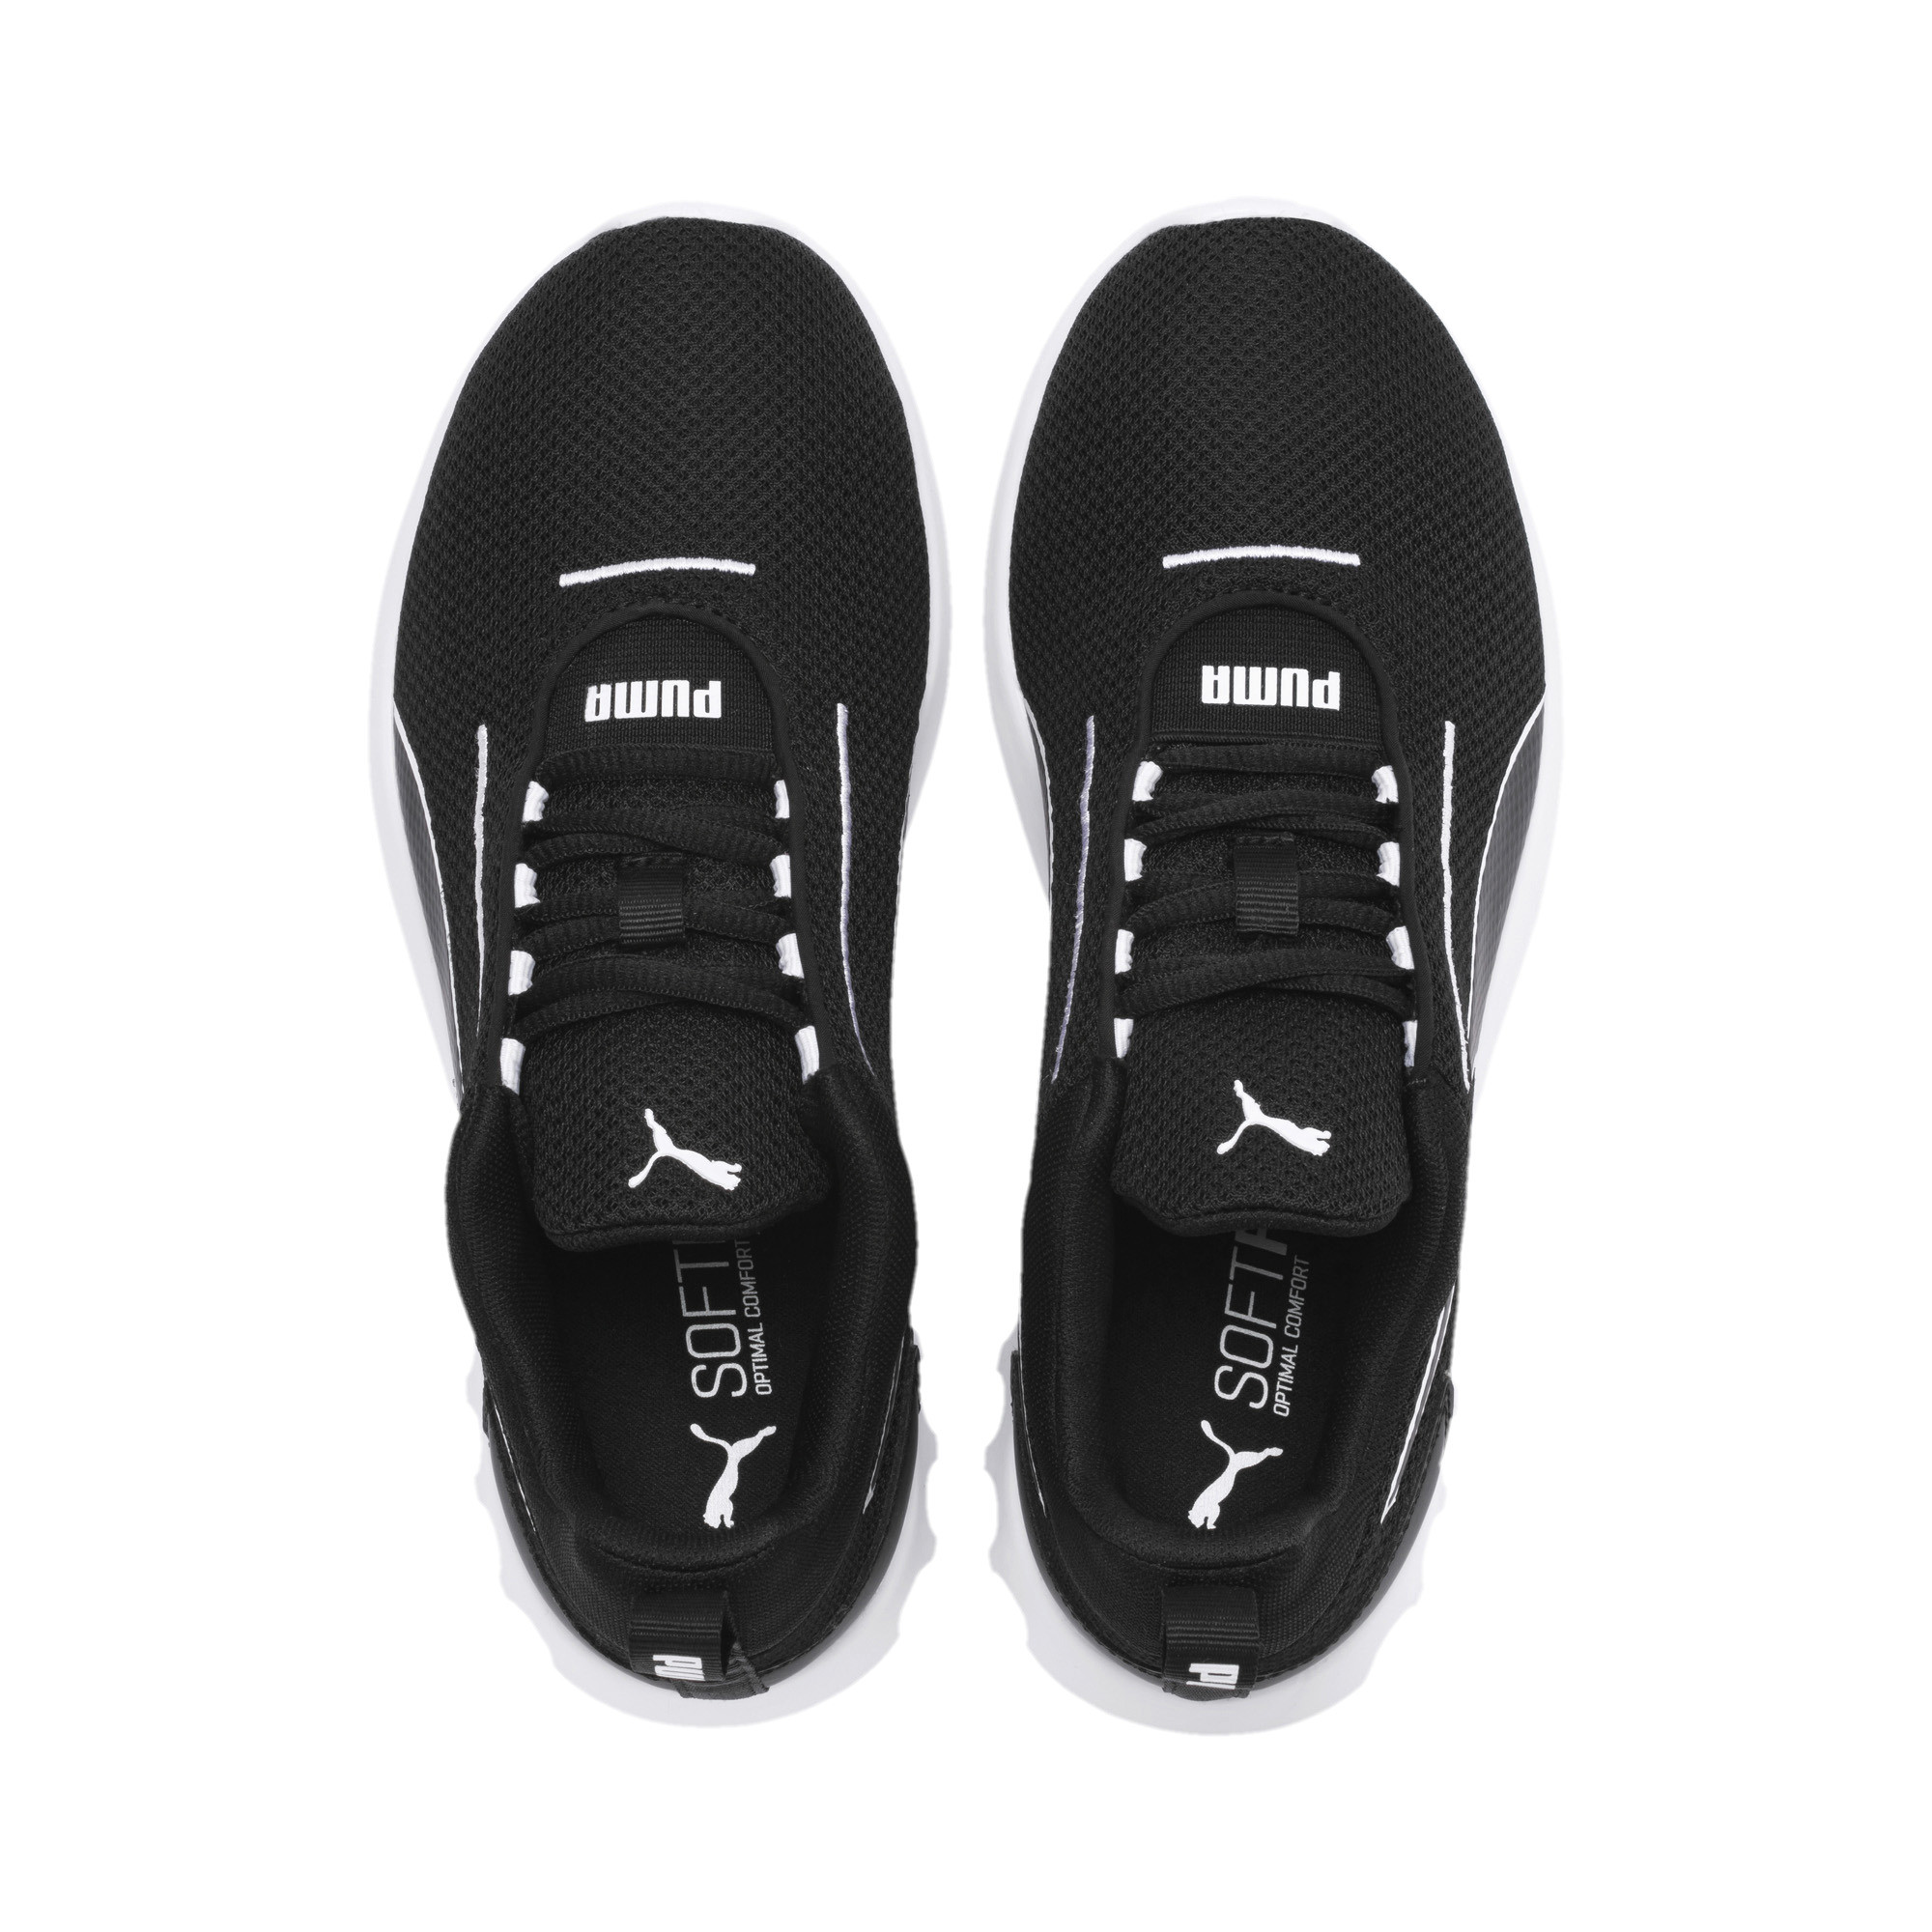 PUMA-Carson-2-Concave-Women-s-Training-Shoes-Women-Shoe-Running thumbnail 19